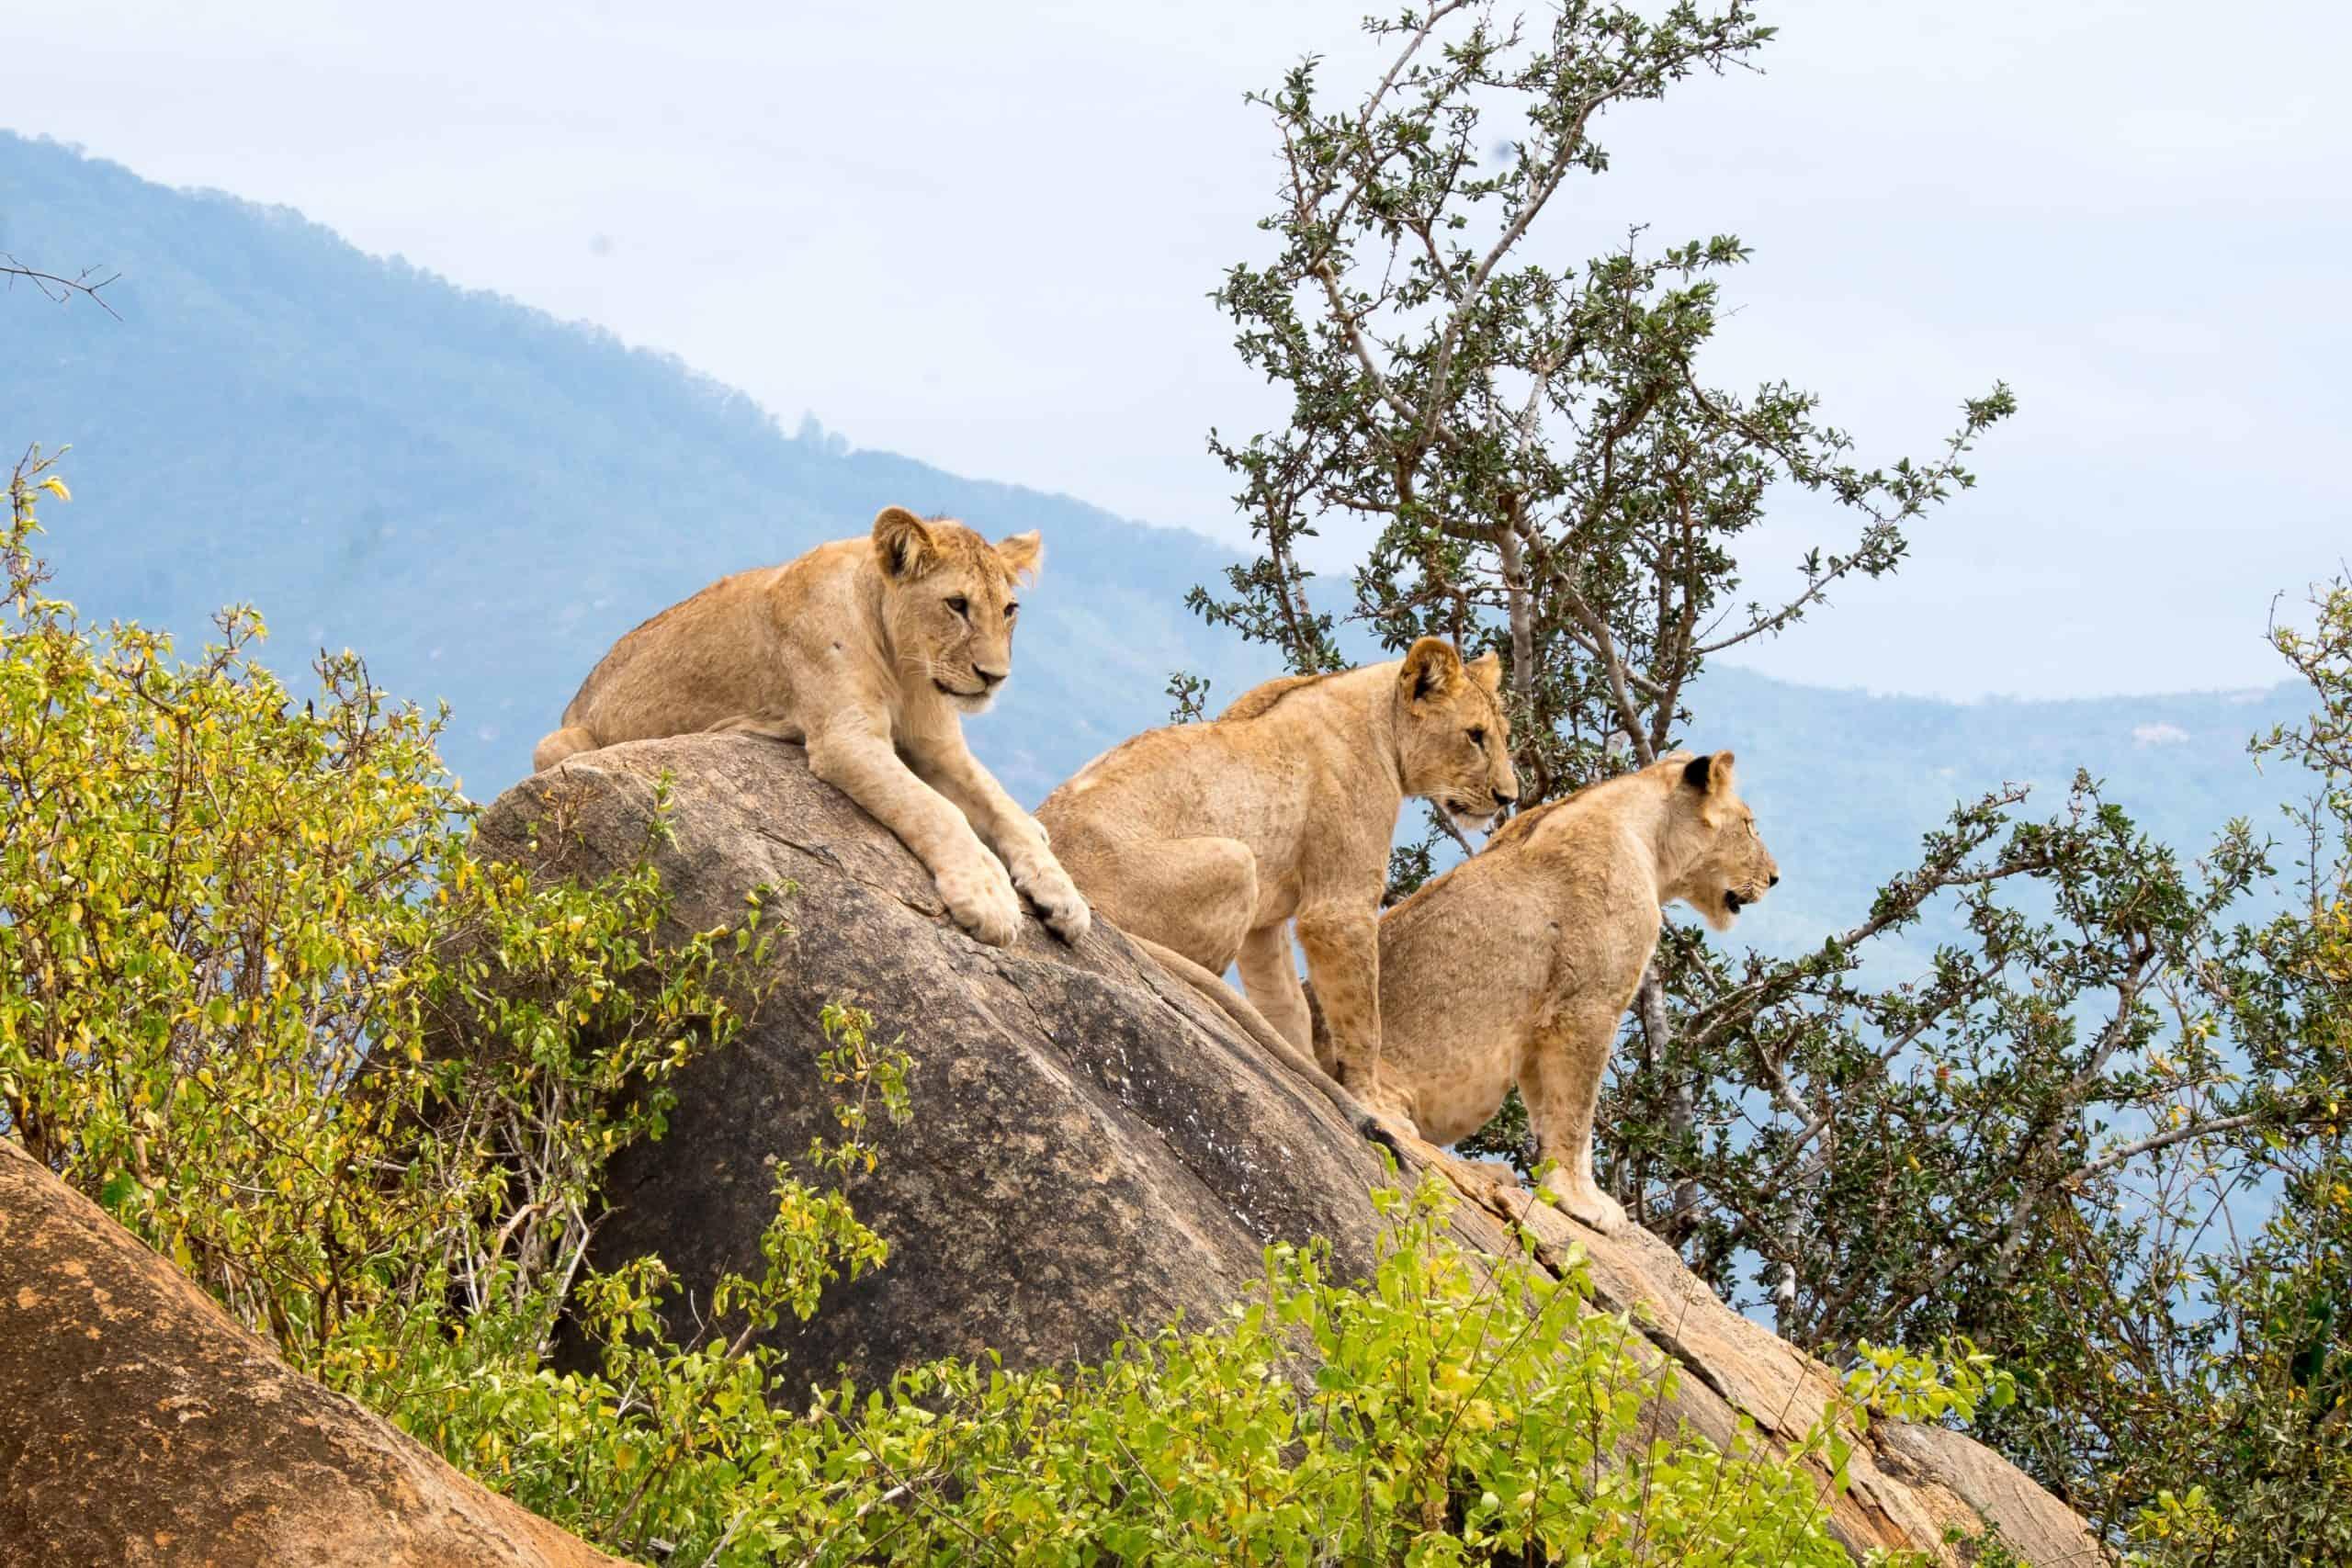 Burigi Chato Safaris Co. Ltd Serengeti Norongoro Safari Best Tour Agency Company Operator In Moshi Arusha Tanzania Africa) (40)